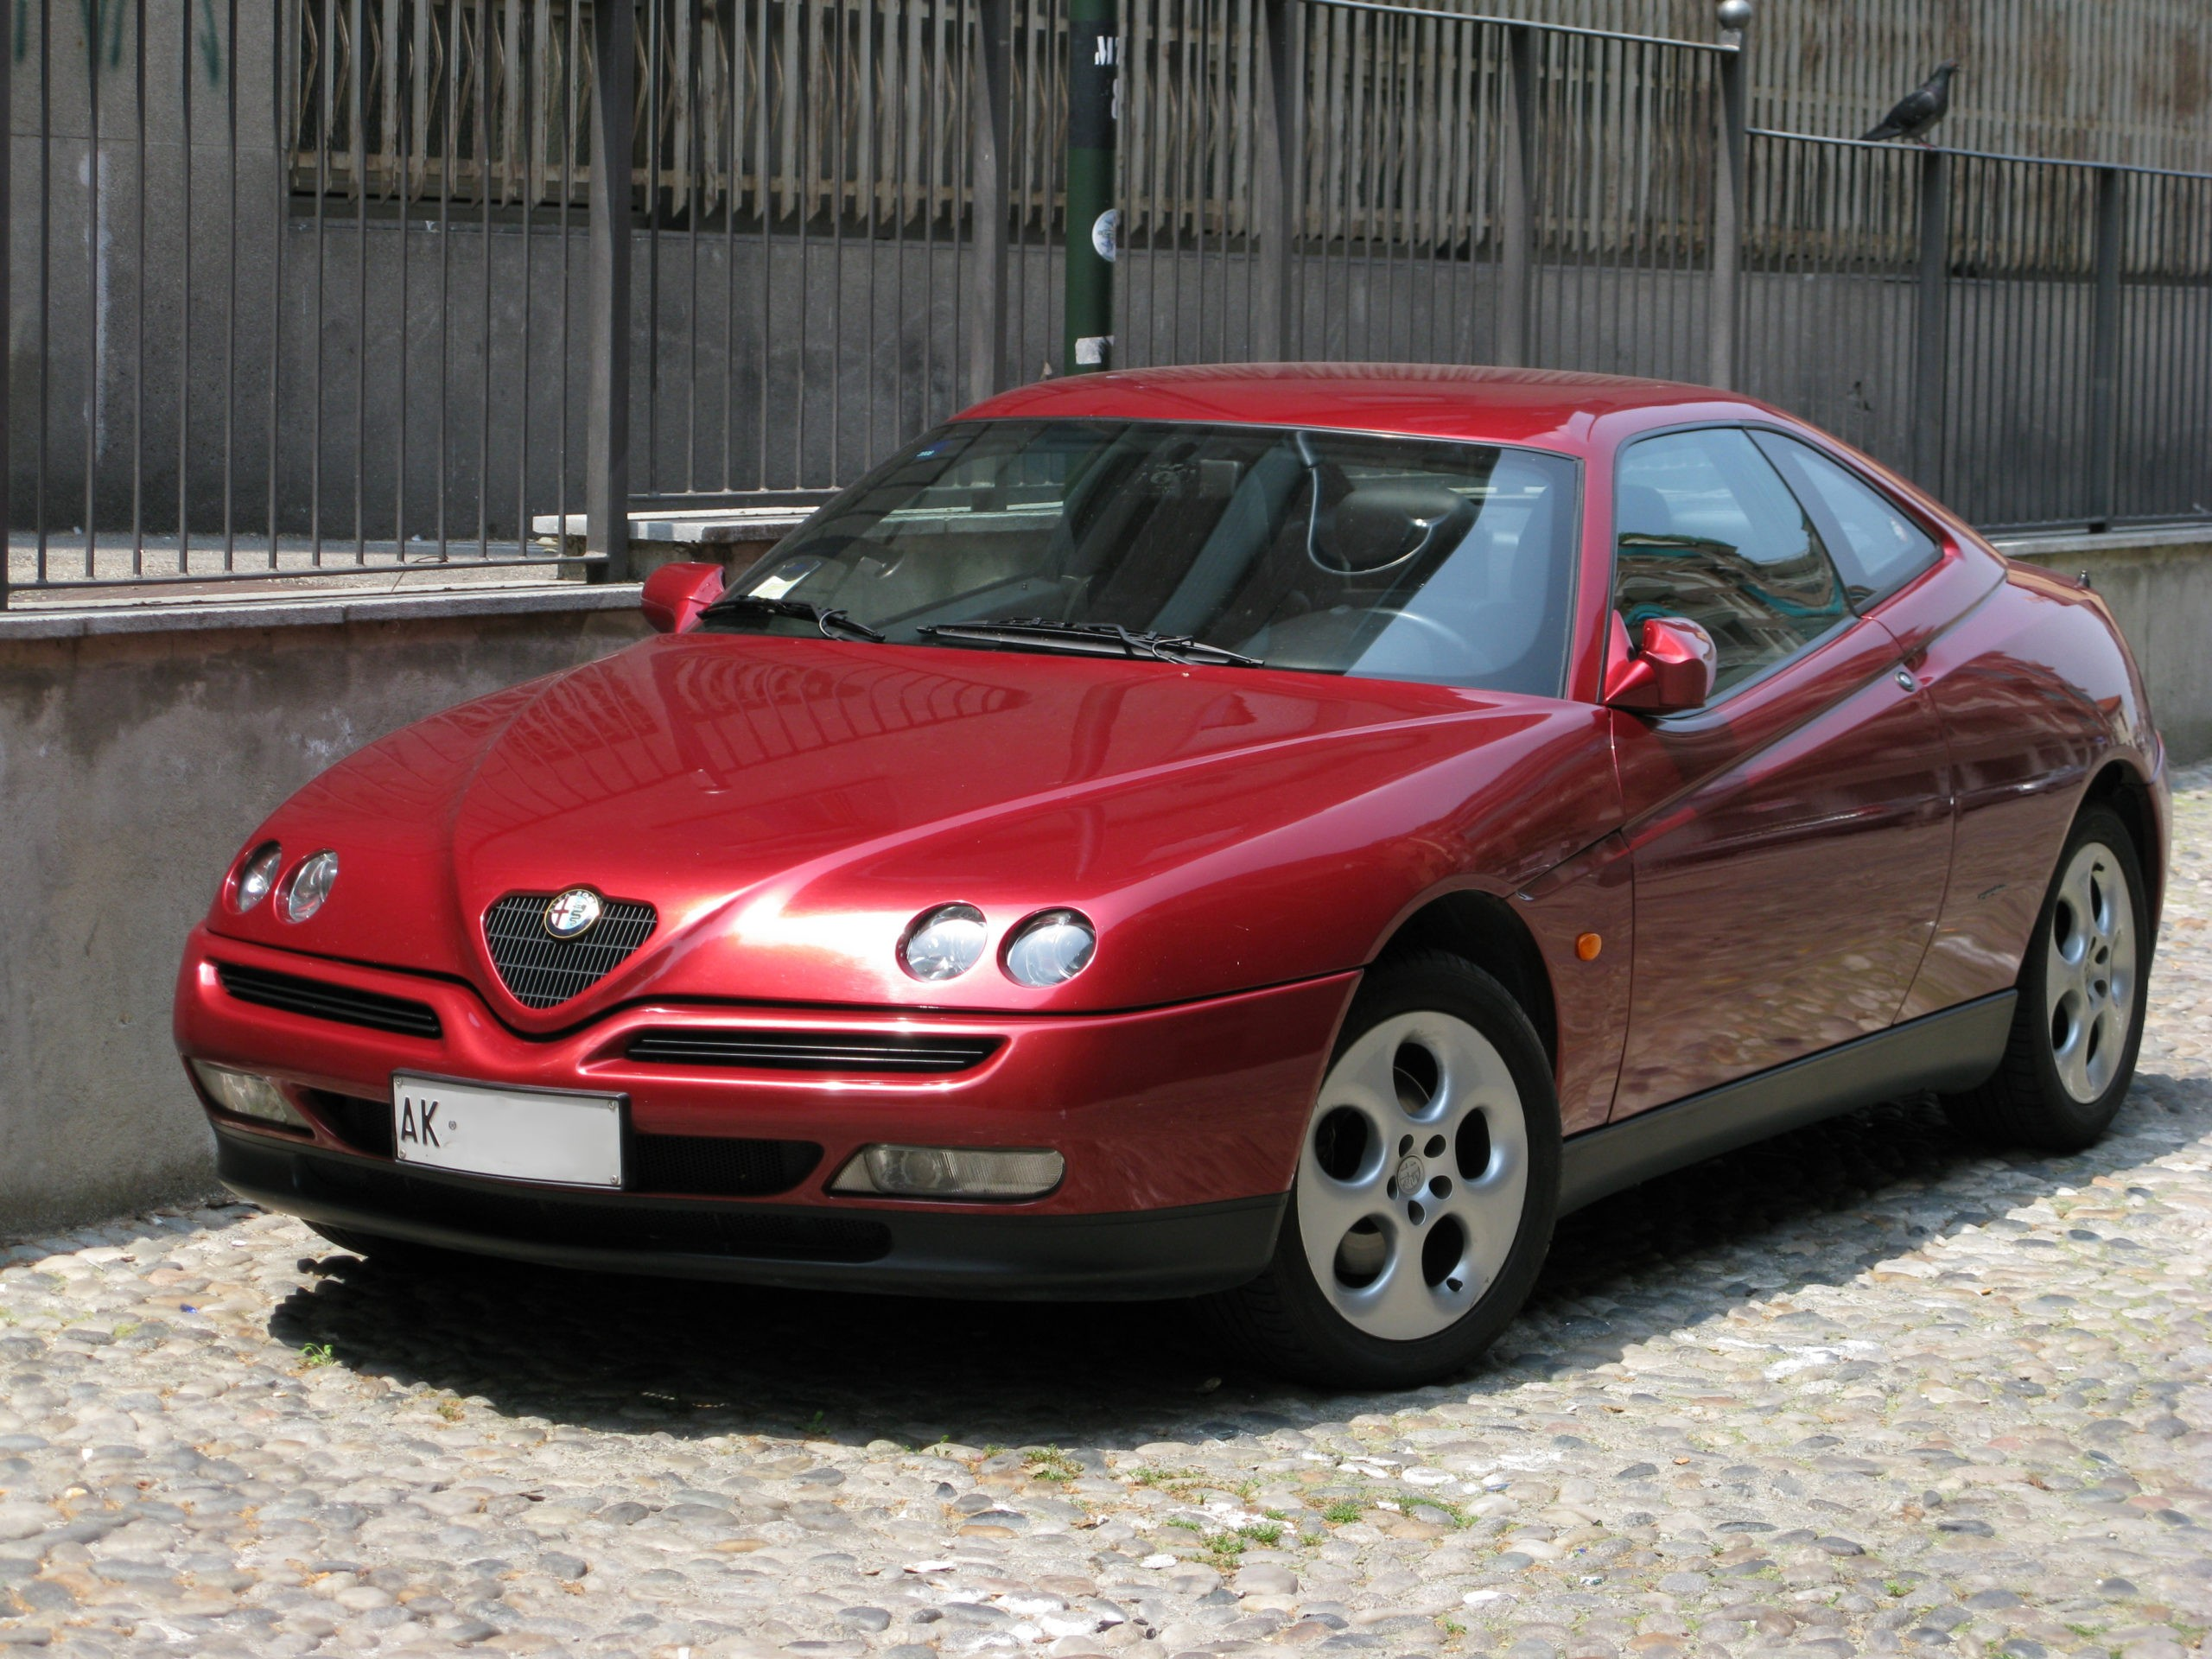 Alfa Romeo GTV Coupé